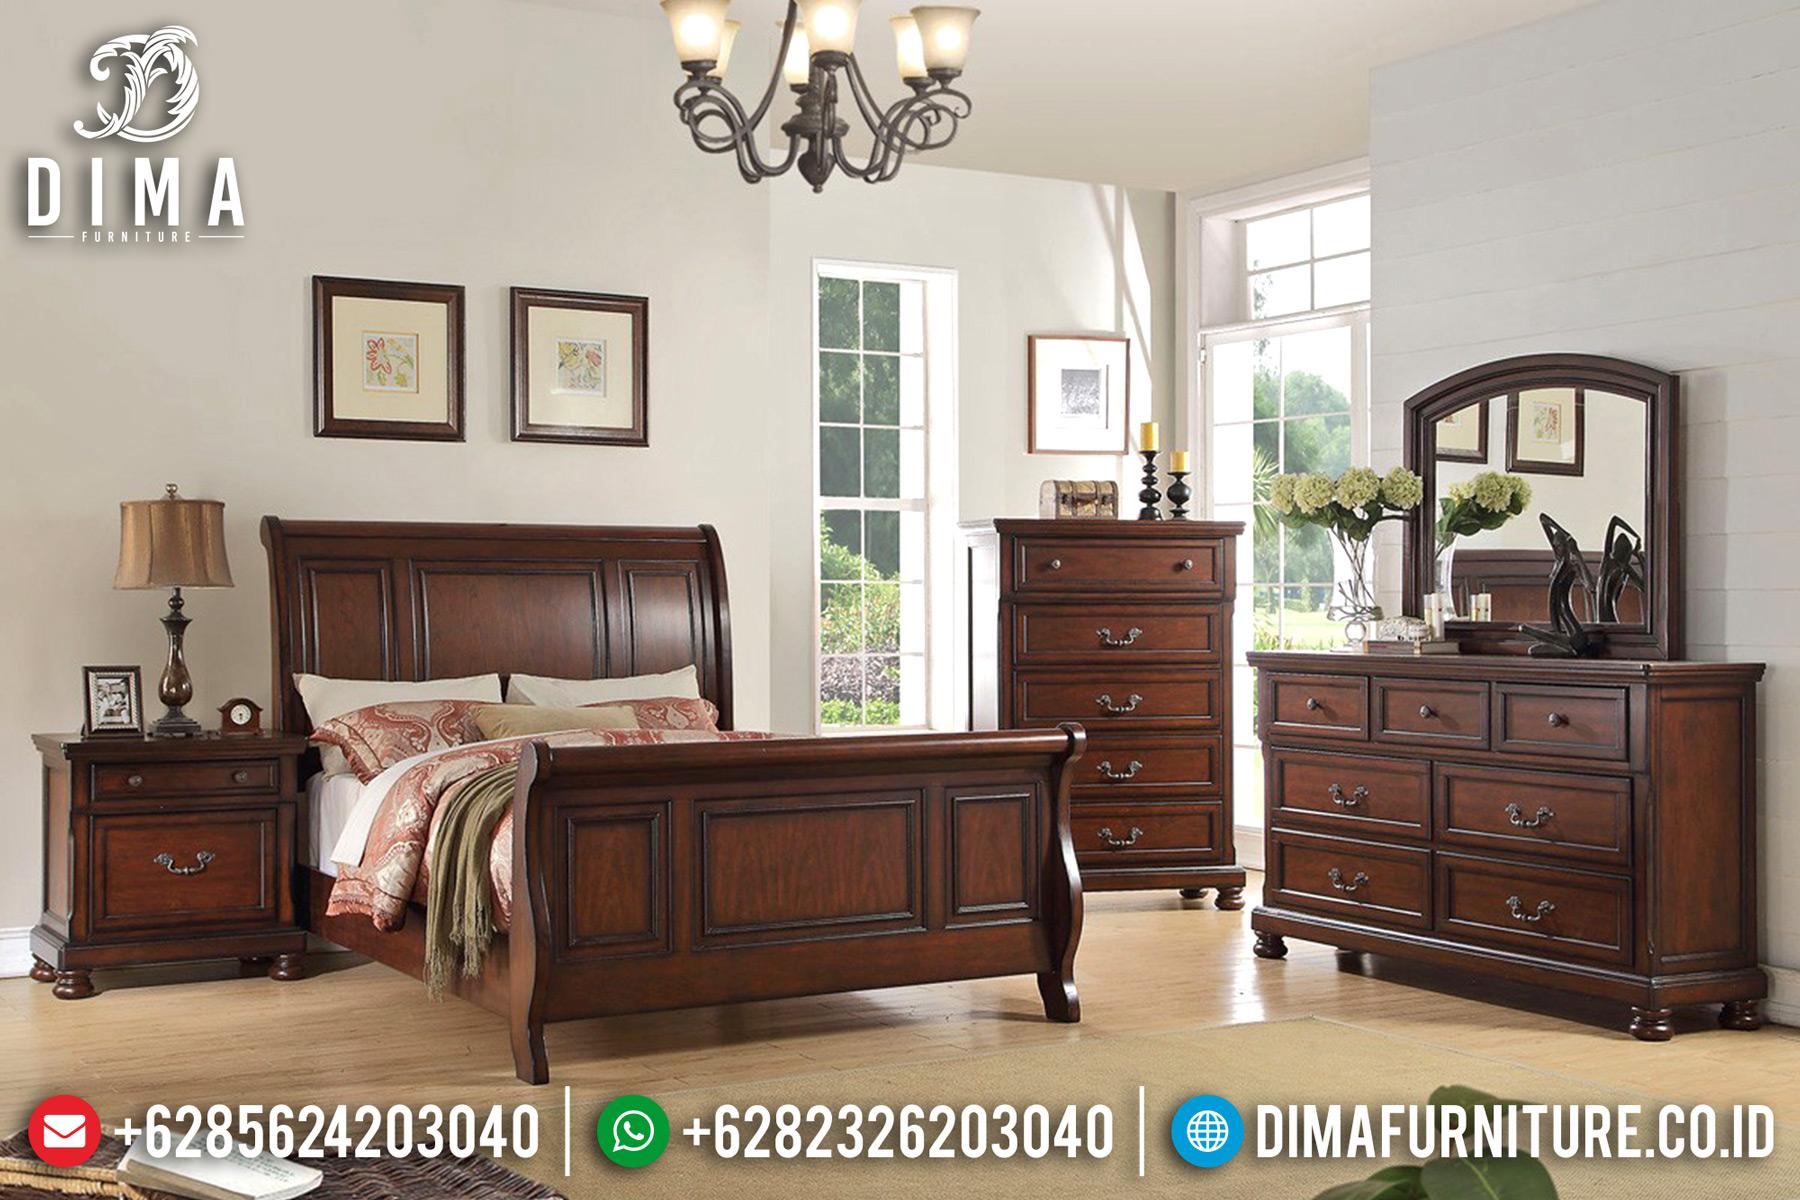 Kamar Set Minimalis Mewah Jati Jepara Luxury Natural Terbaru DF-0493